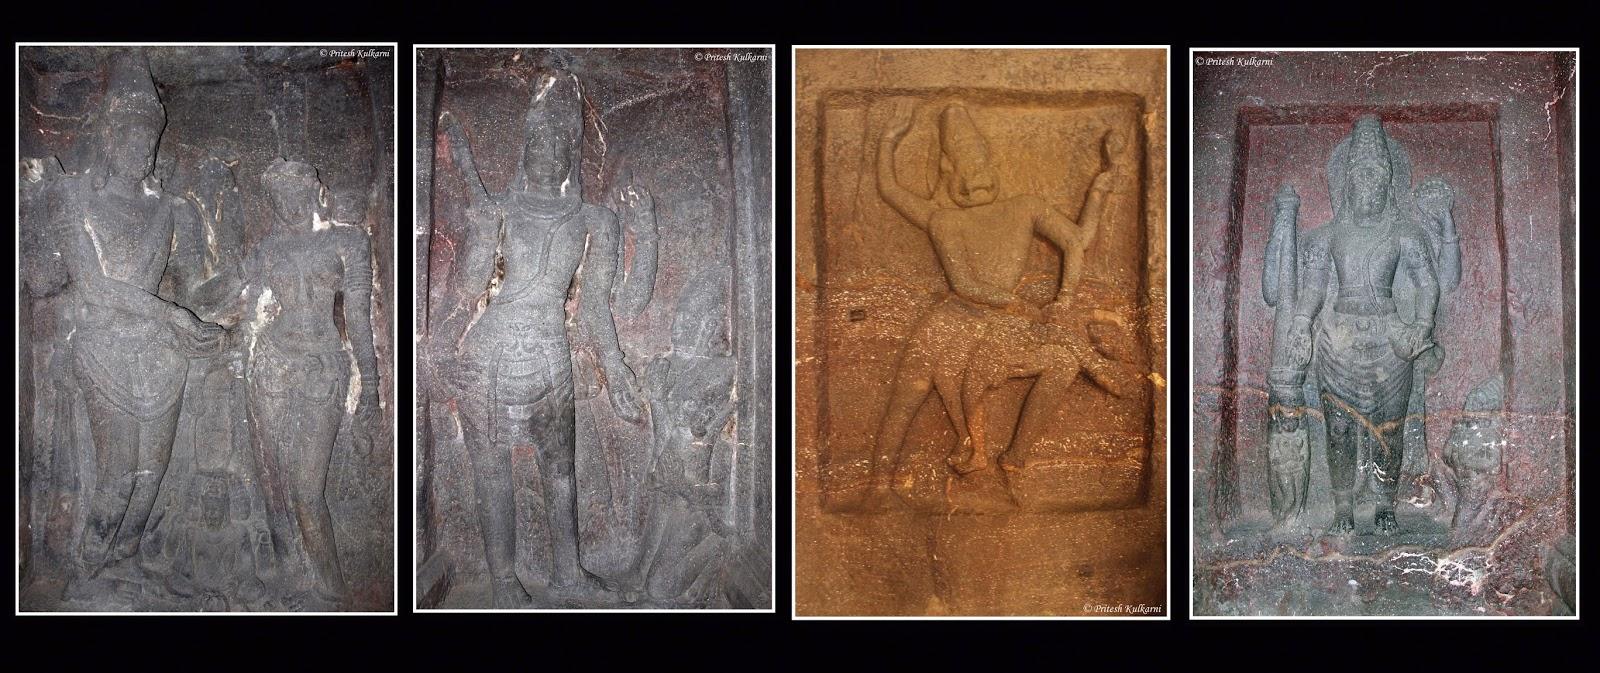 Sculpted panels on wall - stories related to Ramayana, mahabharat, Lord Vishu and Lord Shankar